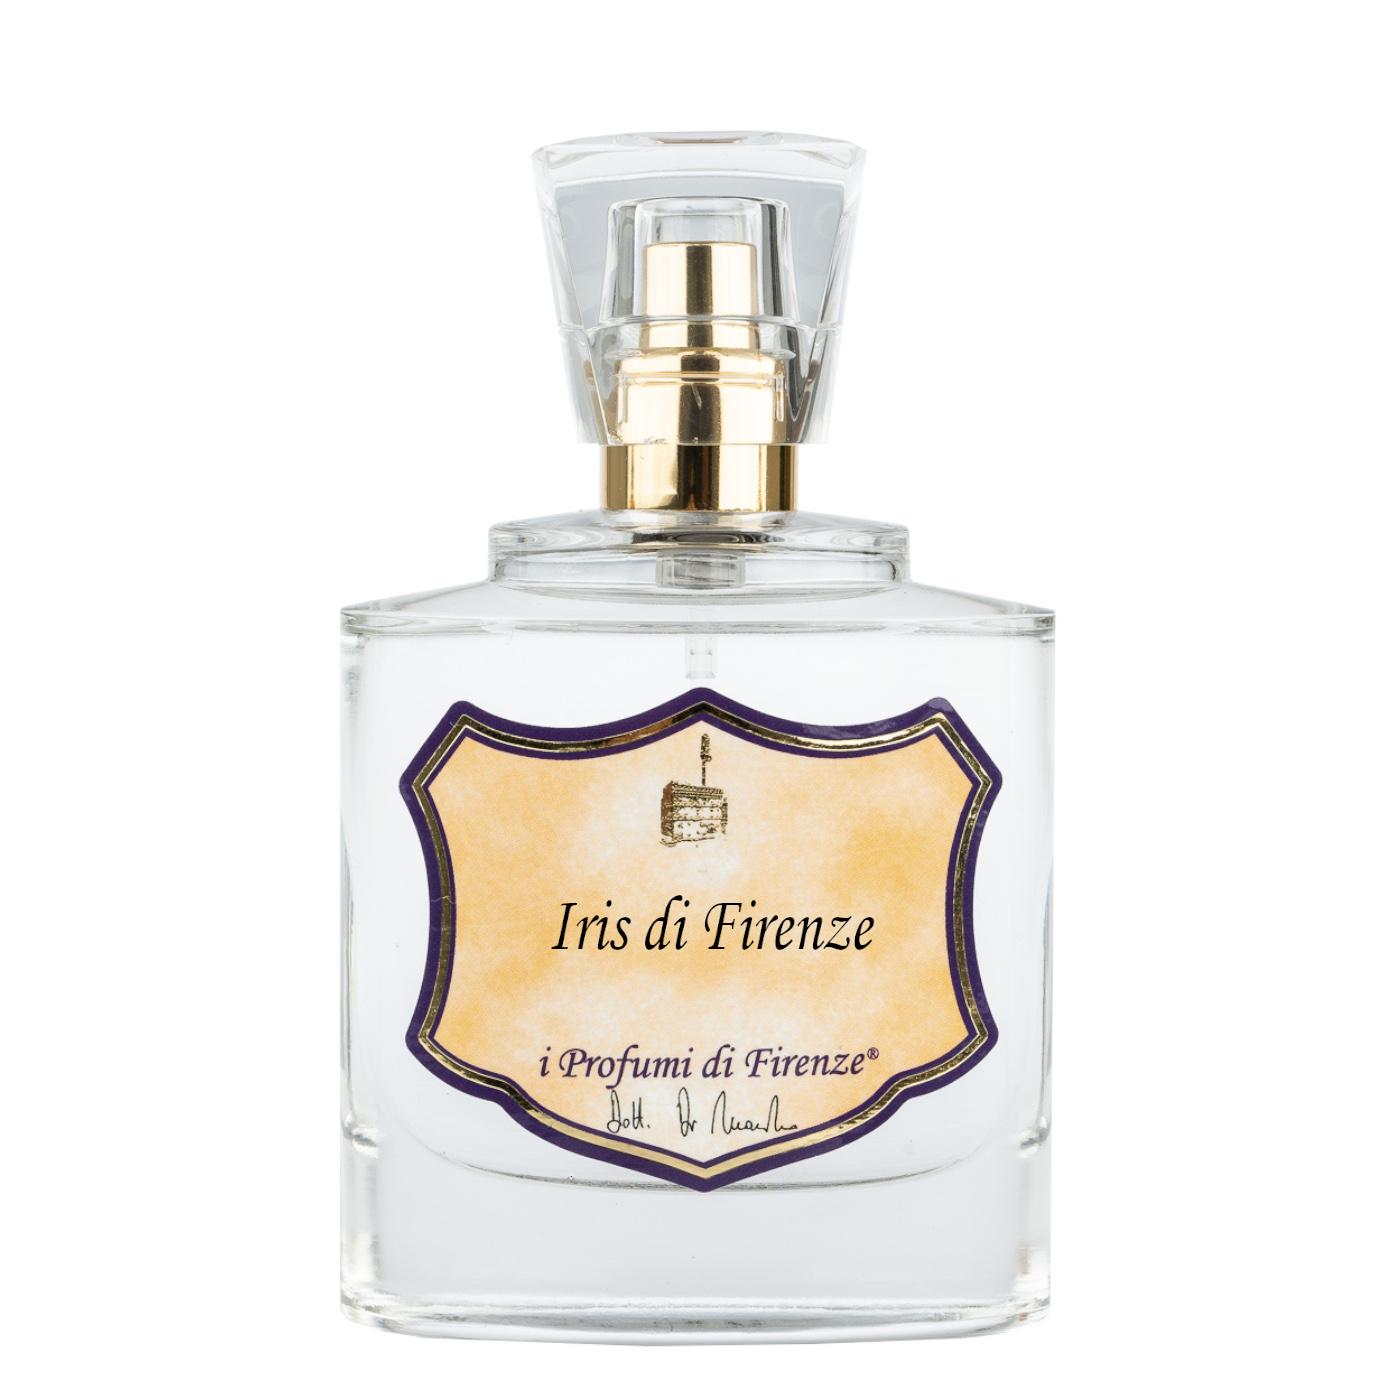 IRIS DI FIRENZE - Eau de Parfum-0